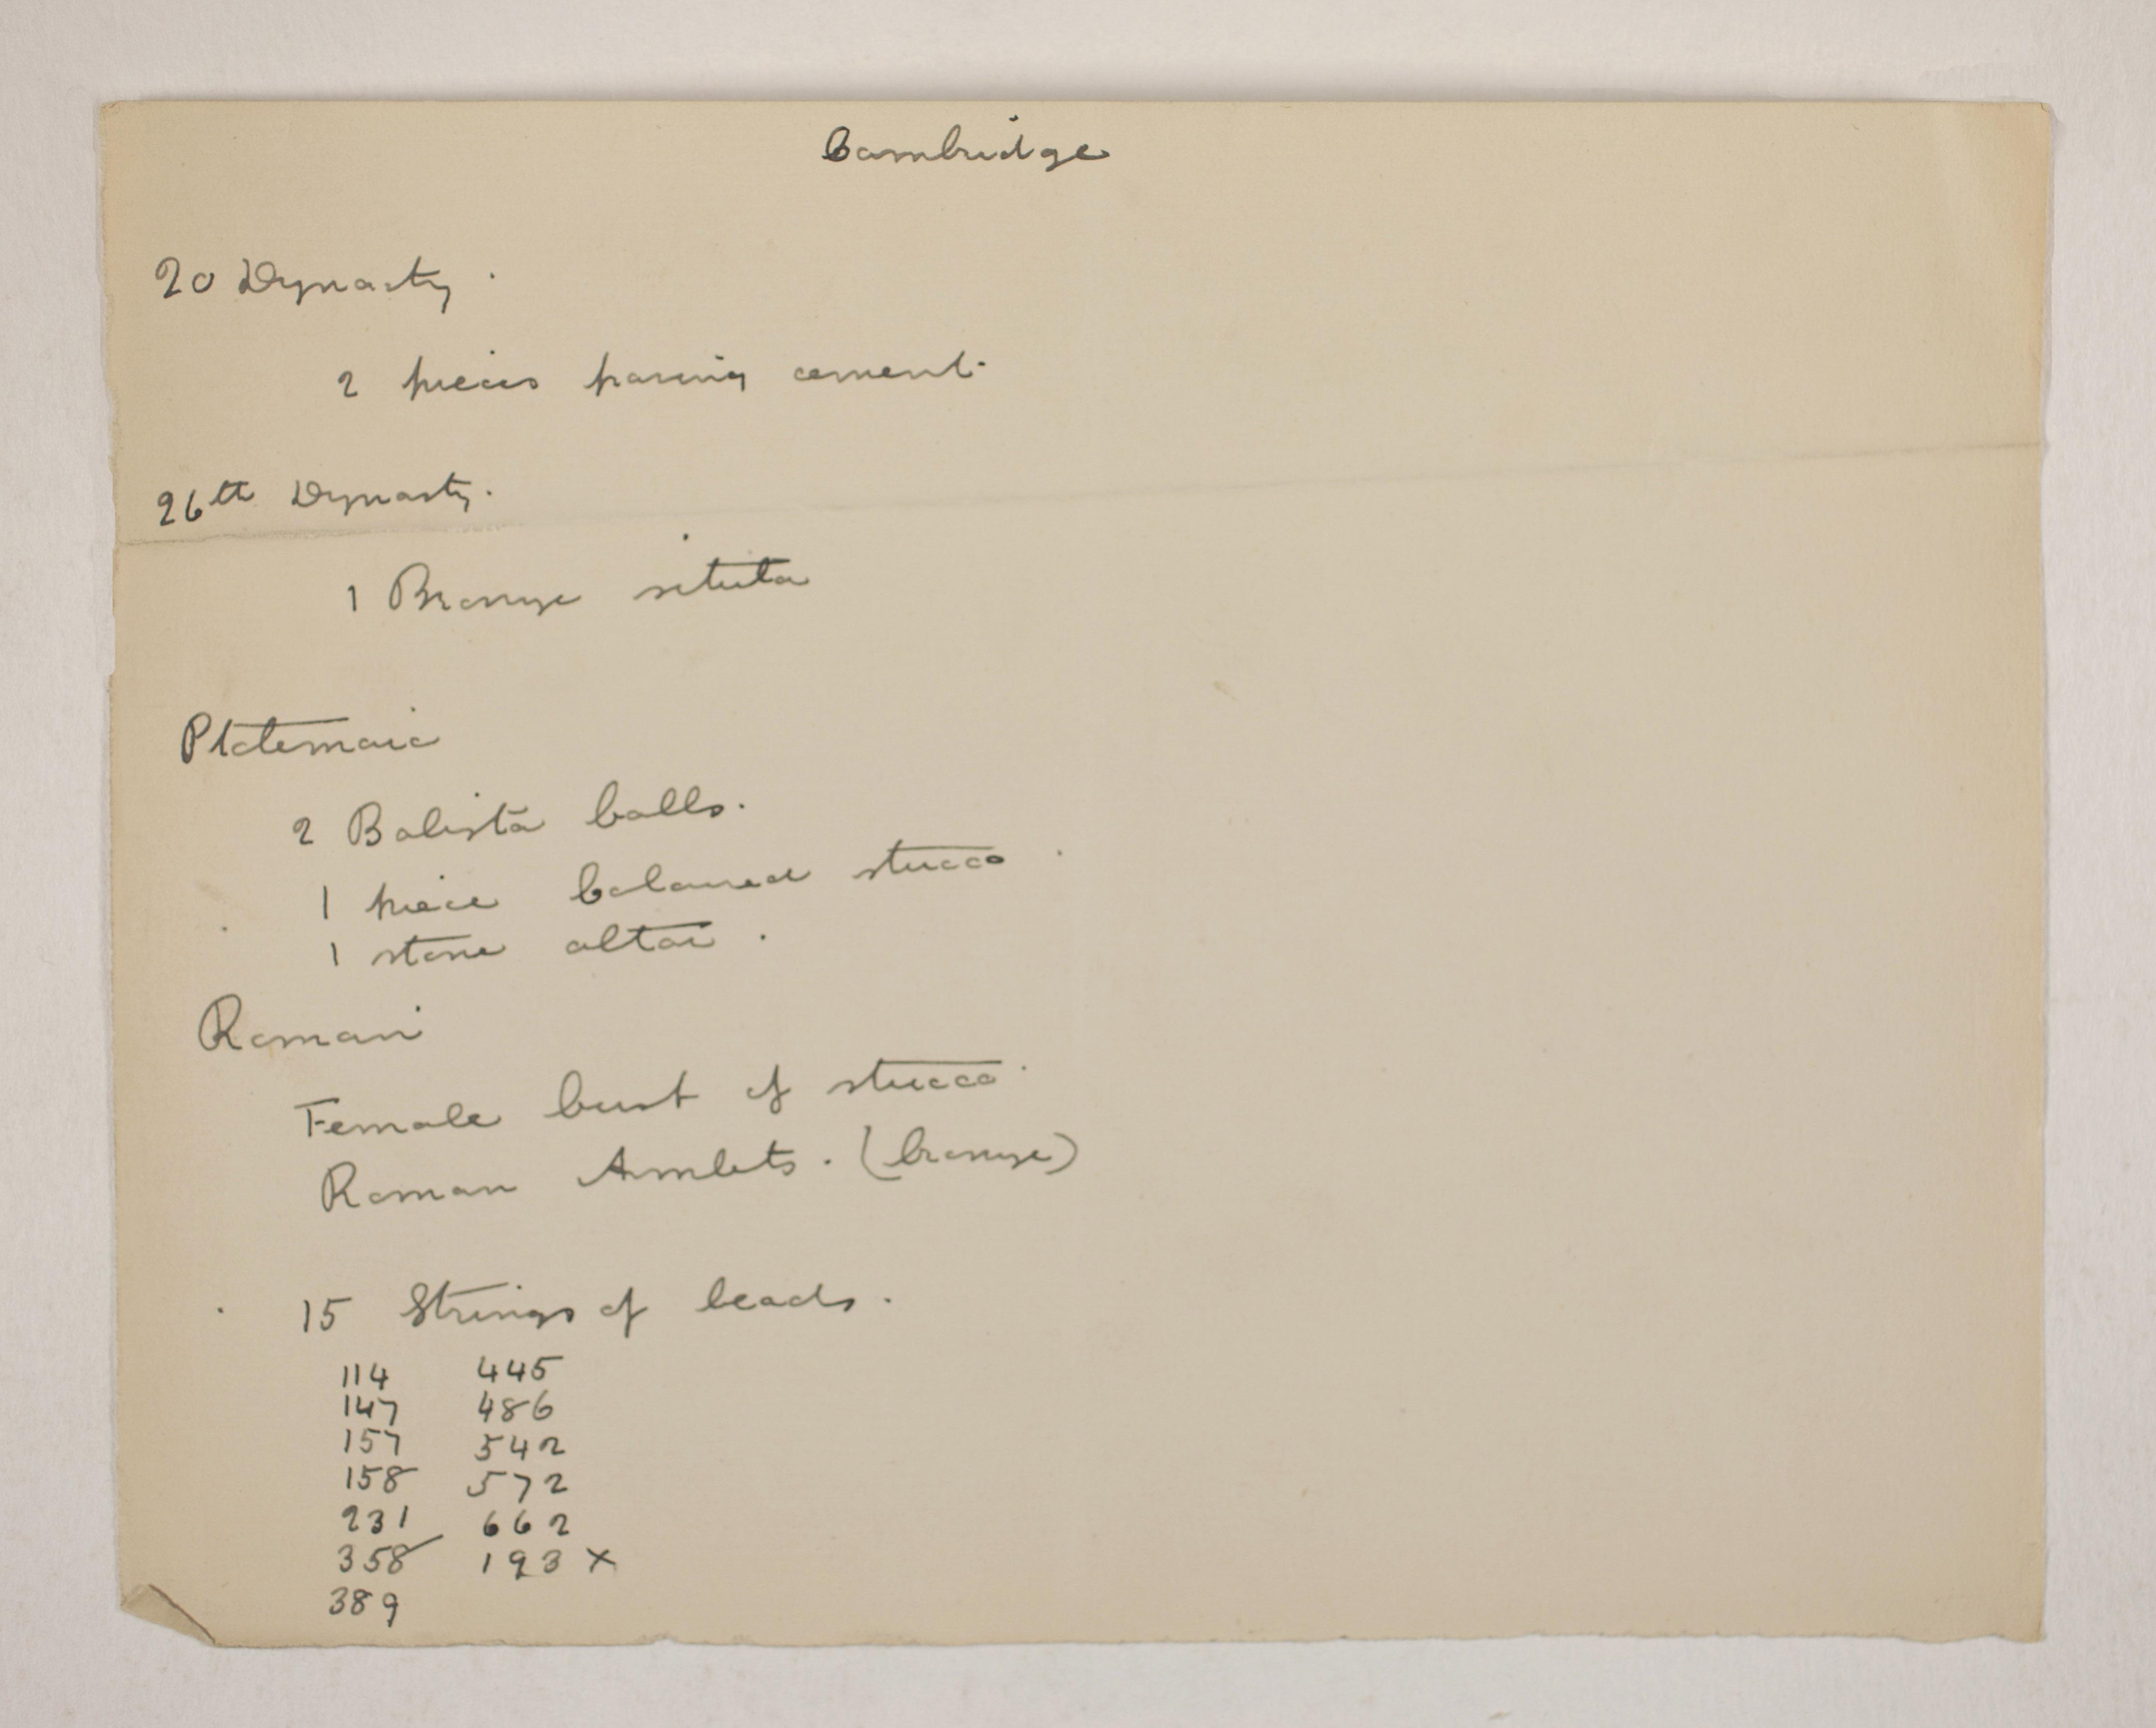 1905-06 Eastern Delta: Belbeis, Tell el-Rataba, Saft el-Hinna, Tell el-Yahudiya, Shaghanbeh, Ghita Individual institution list  PMA/WFP1/D/14/7